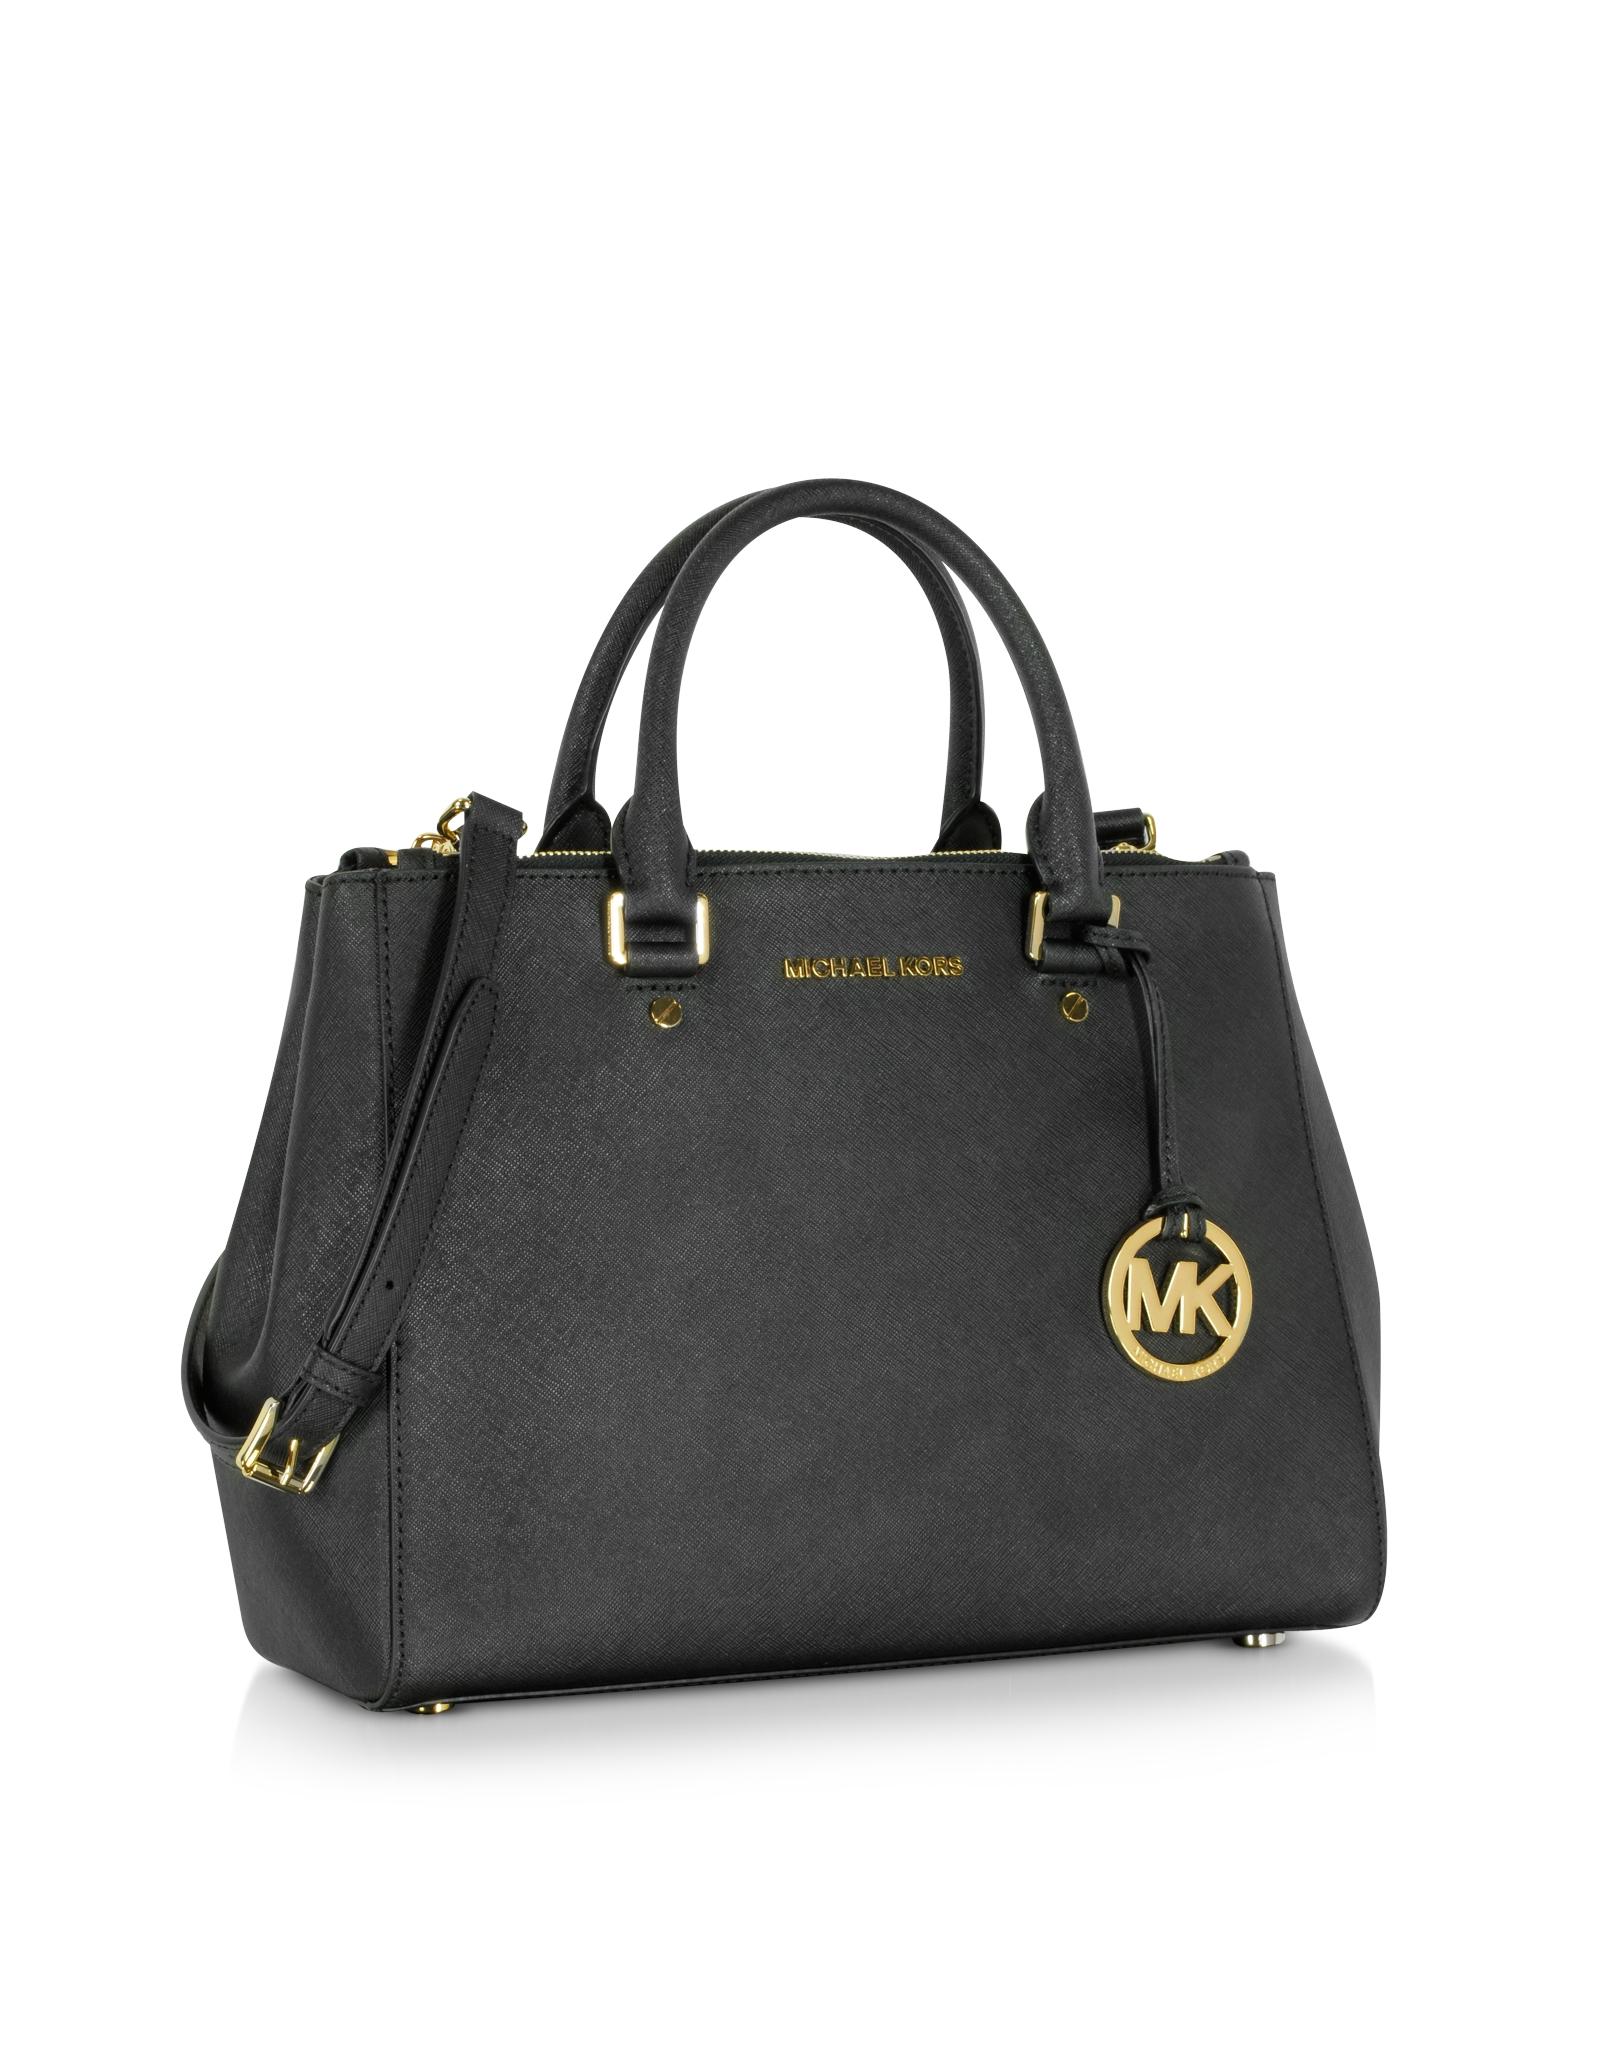 dea93c853a01 Michael Kors Sutton Medium Saffiano Leather Satchel Bag in Black - Lyst